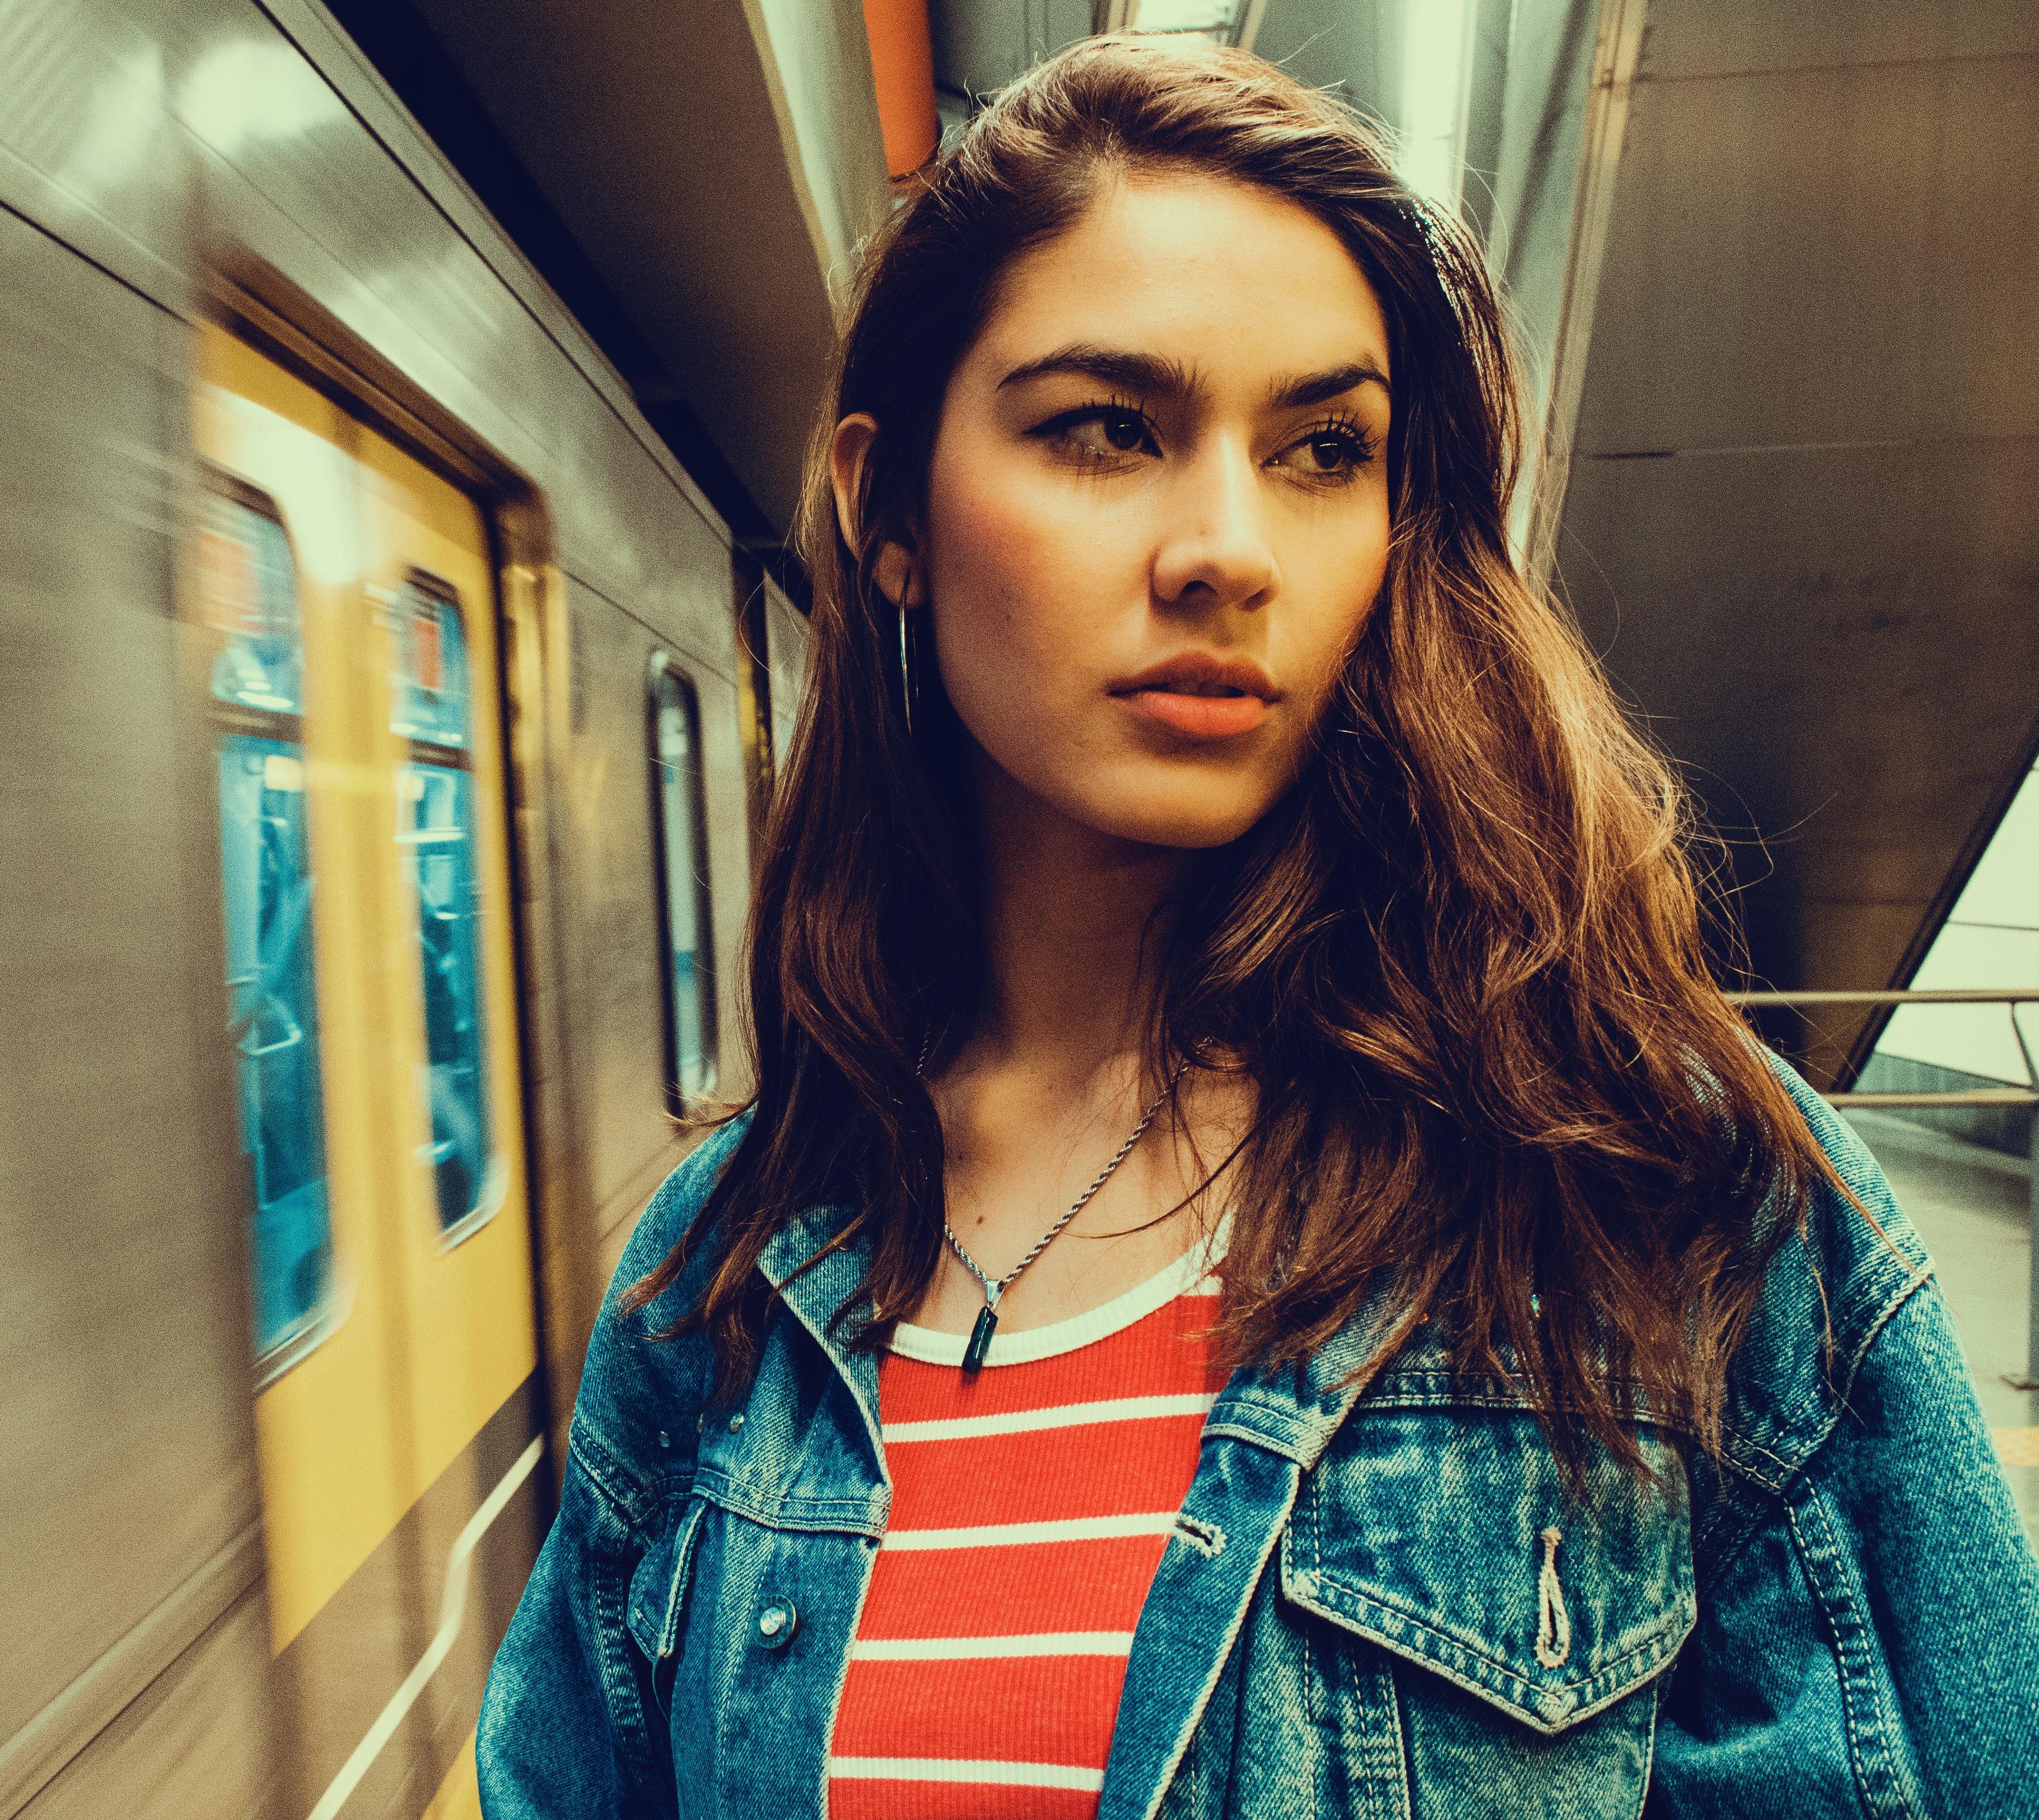 Photo of a Woman Wearing Blue Denim Jacket, Pretty, Street, Style, Pose, HQ Photo